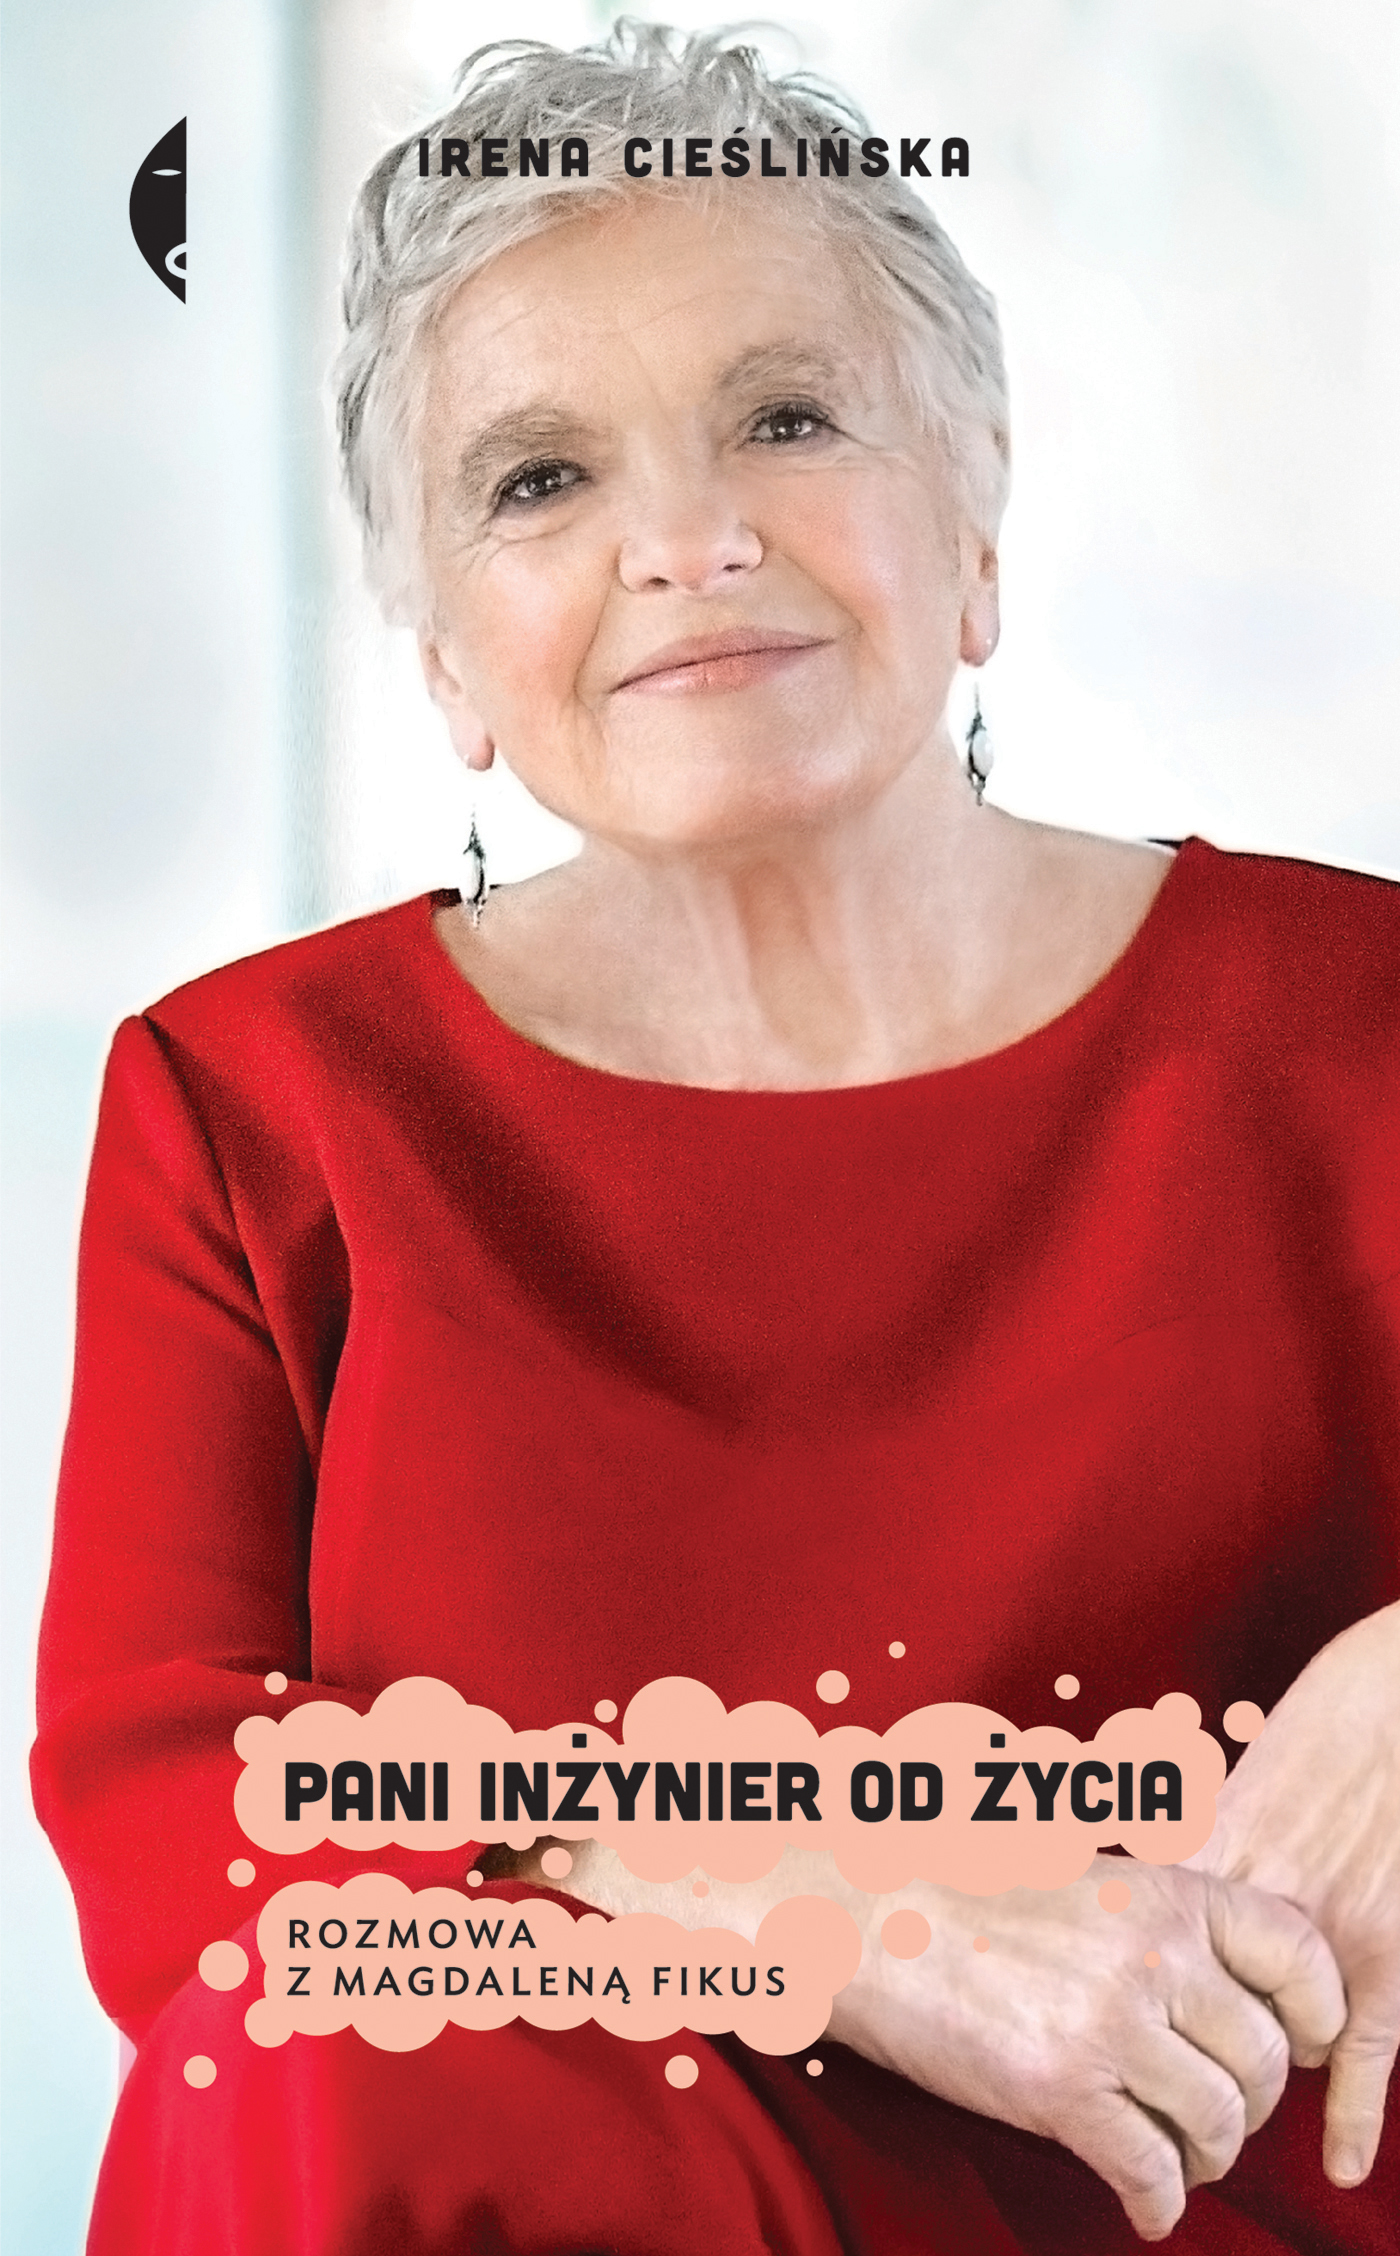 https://czarne.com.pl/uploads/catalog/product/cover/986/Magdalena_Fikus_96DPI_szerokosc1400px_RGB.jpg